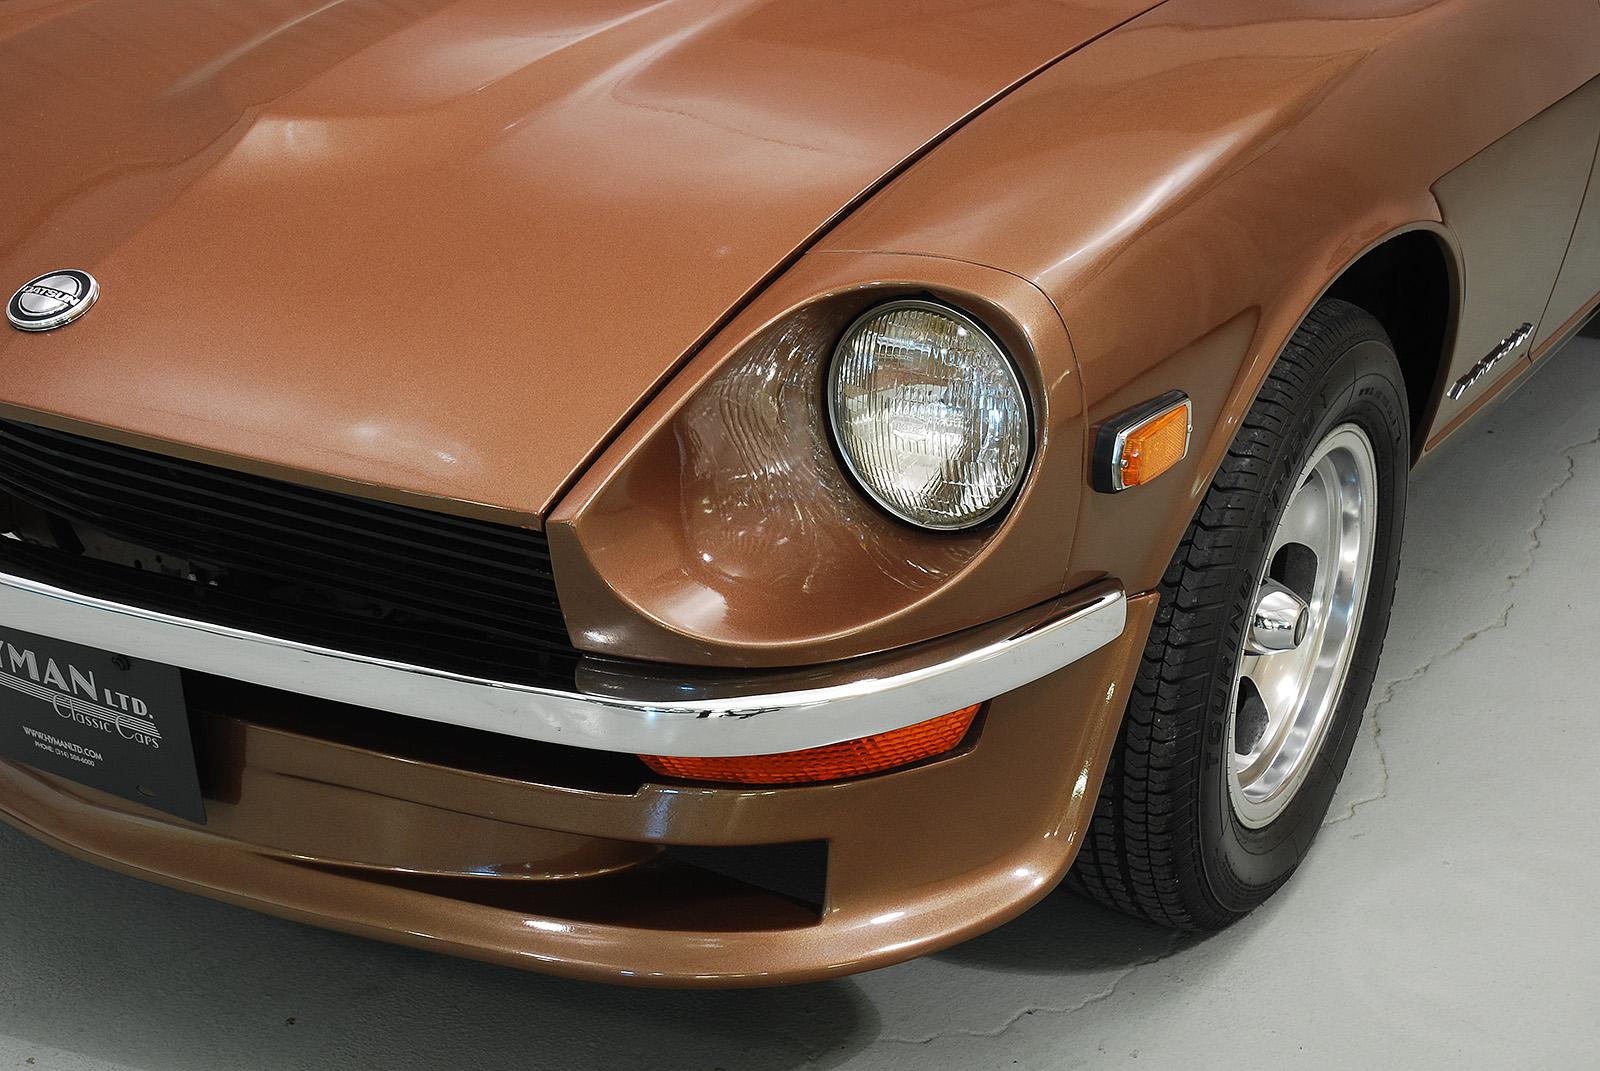 1973 Datsun 240Z | Hyman Ltd. Classic Cars